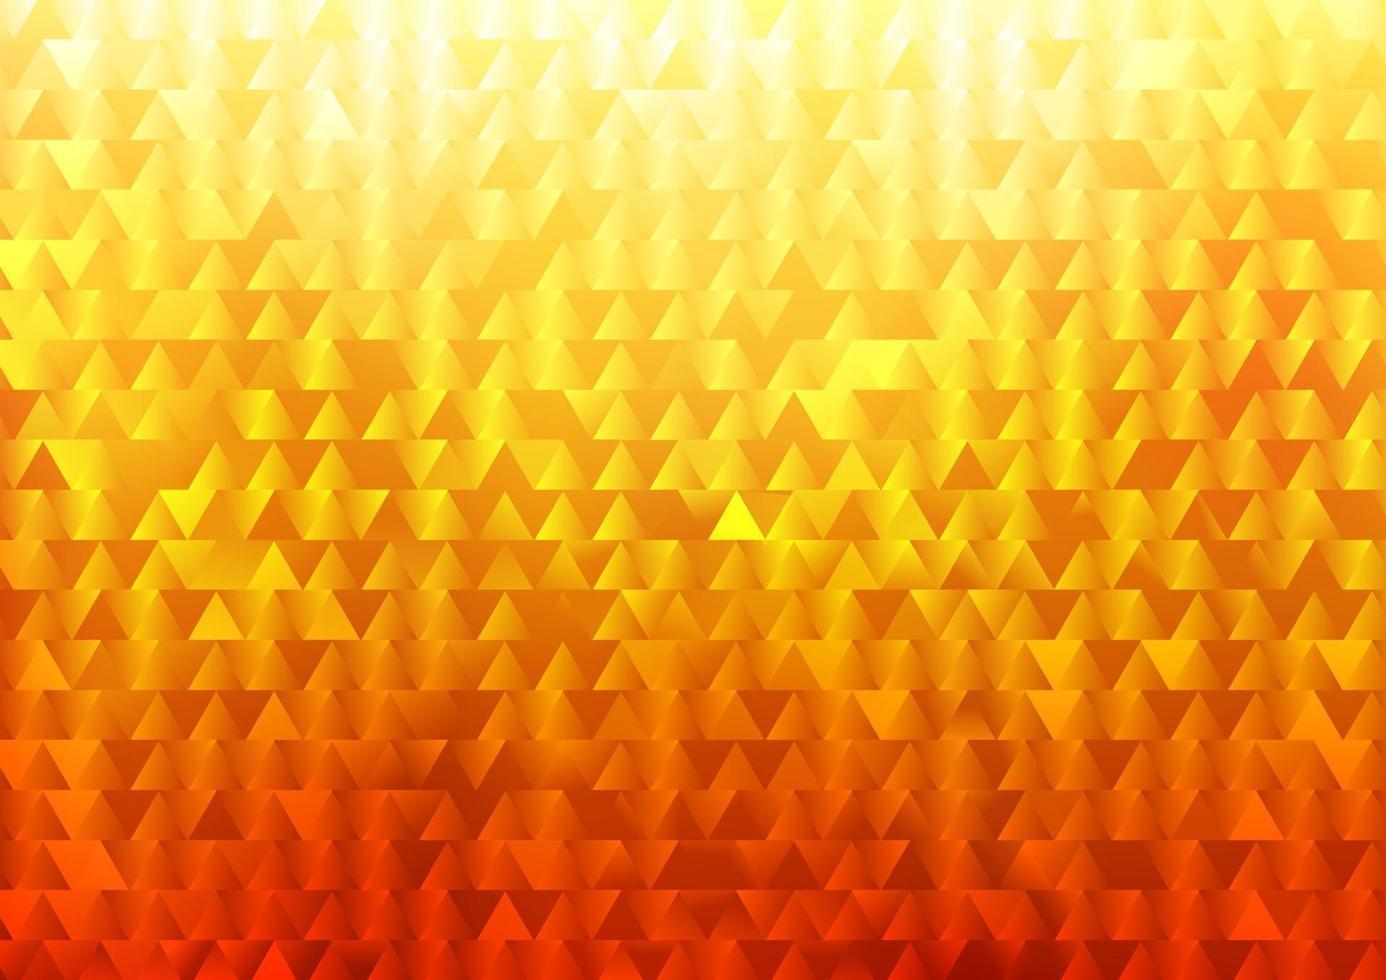 abstrakt bakgrund geometrisk triangel former mönster vektor